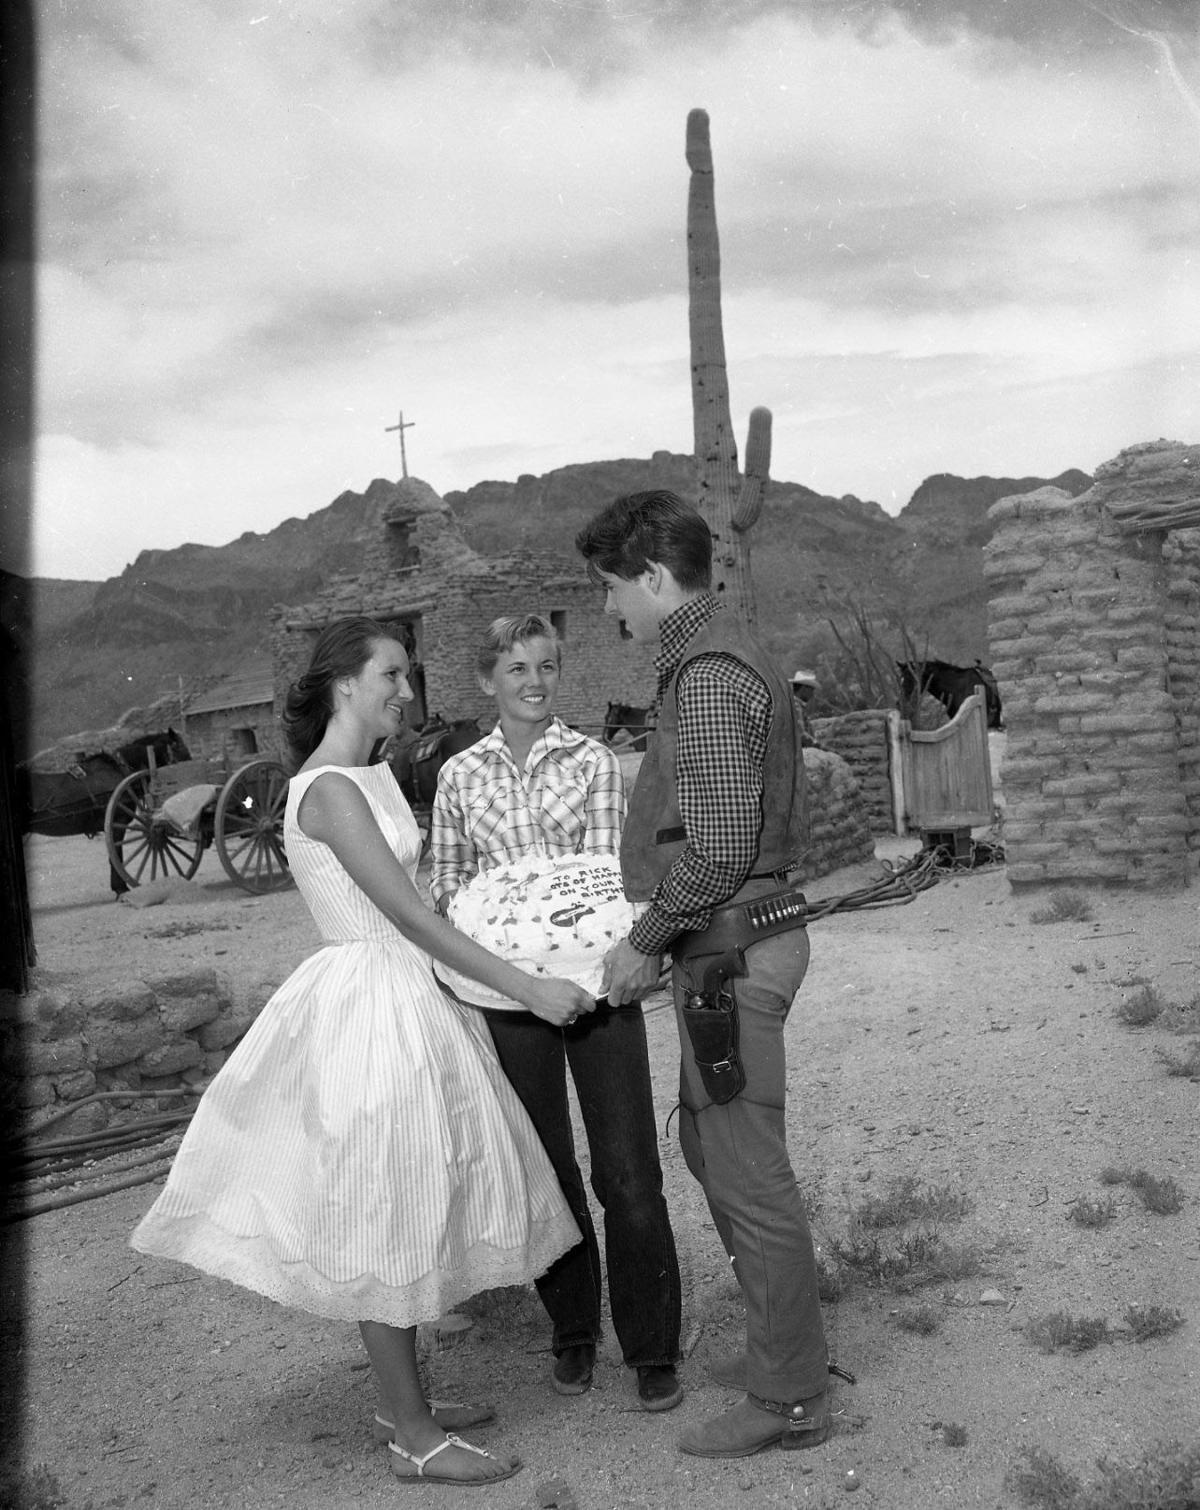 Westerns filmed at Old Tucson | Entertainment | tucson com